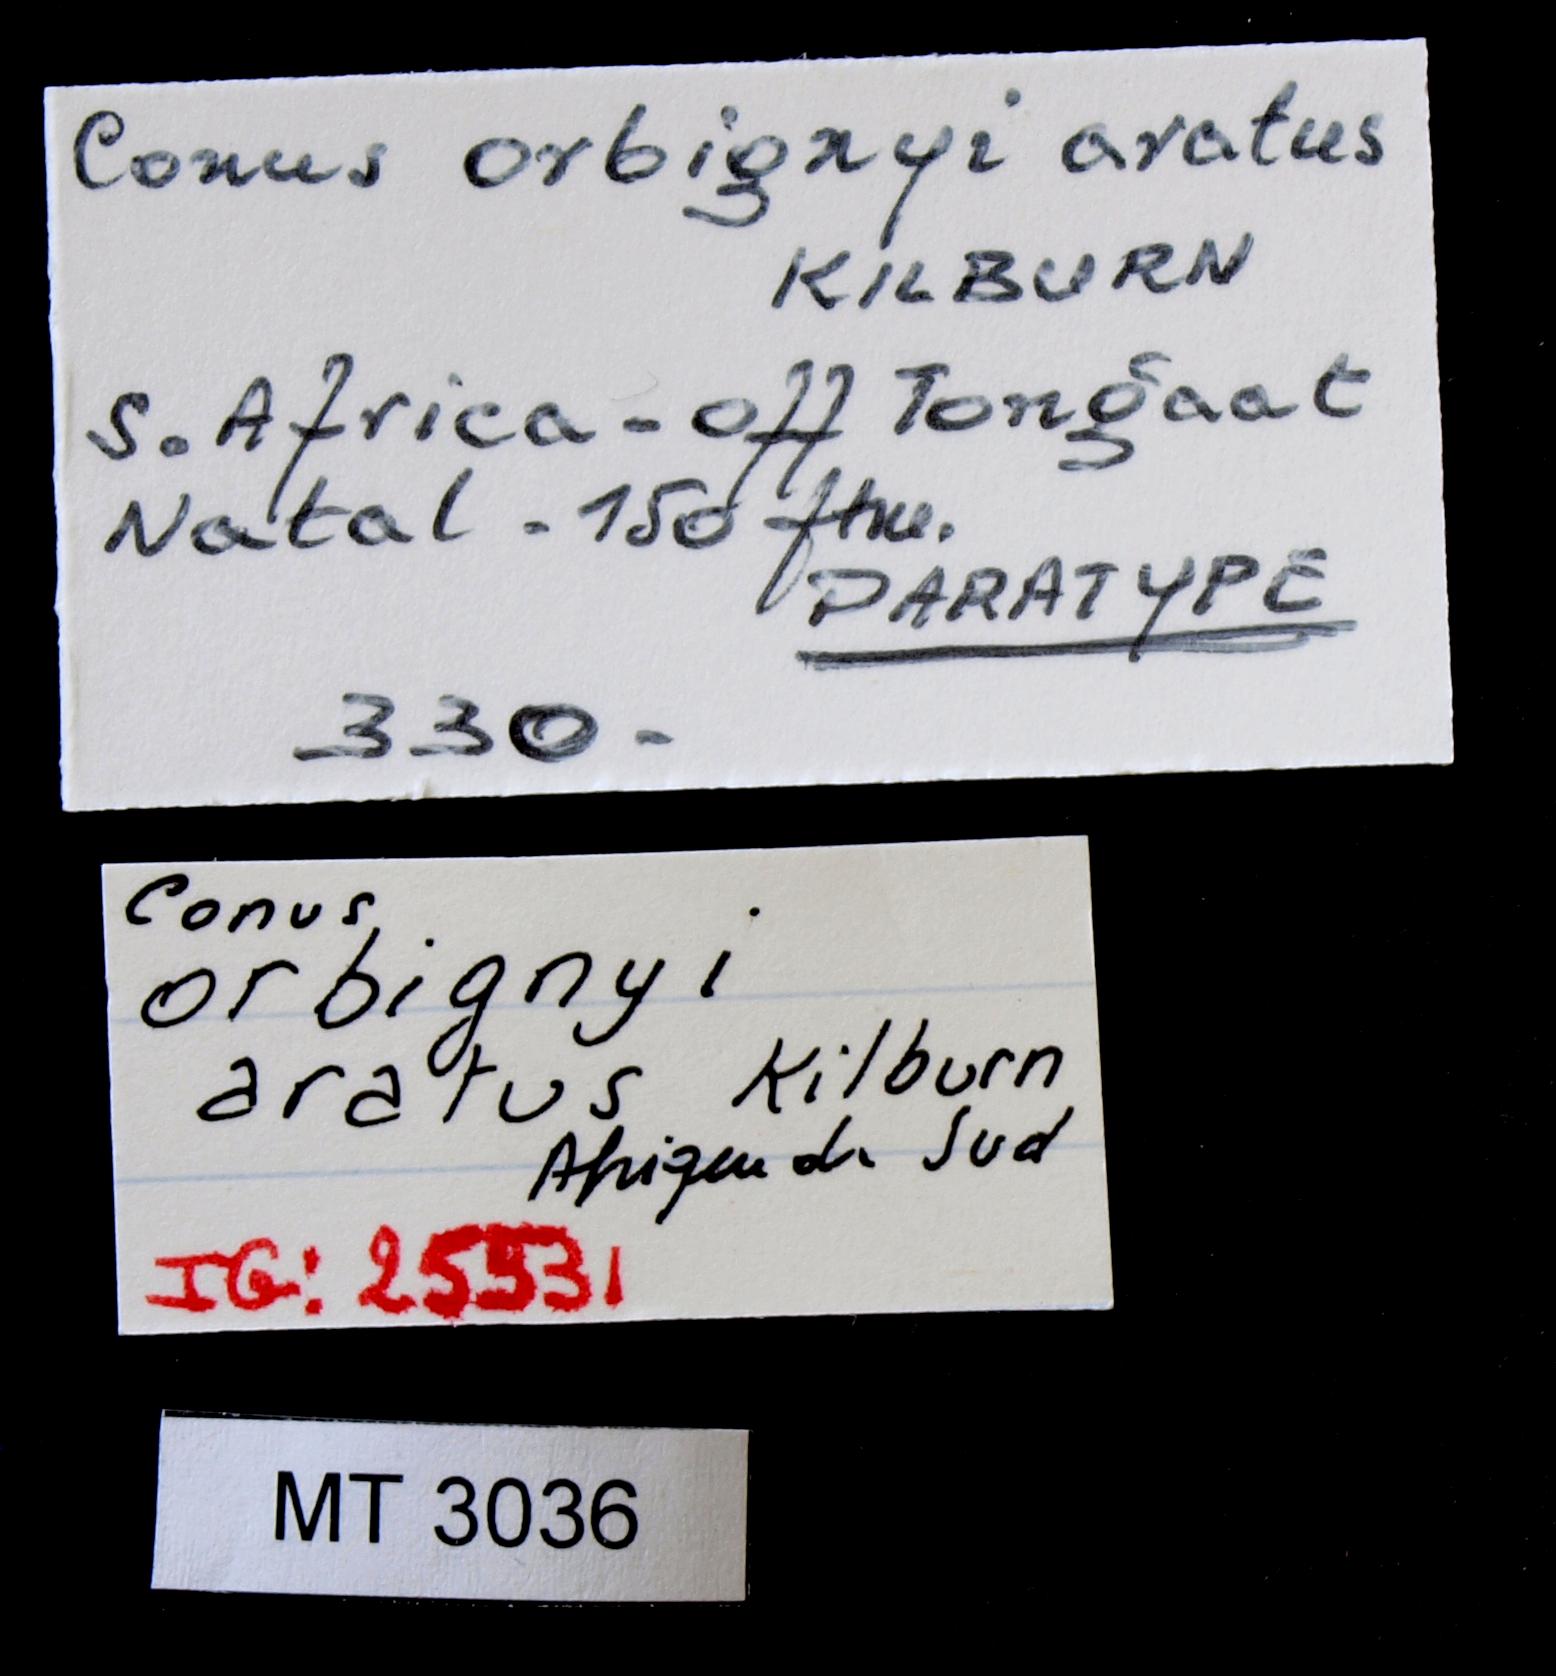 BE-RBINS-INV MT.3036 Conus orbignyi aratus Pt Lb.JPG